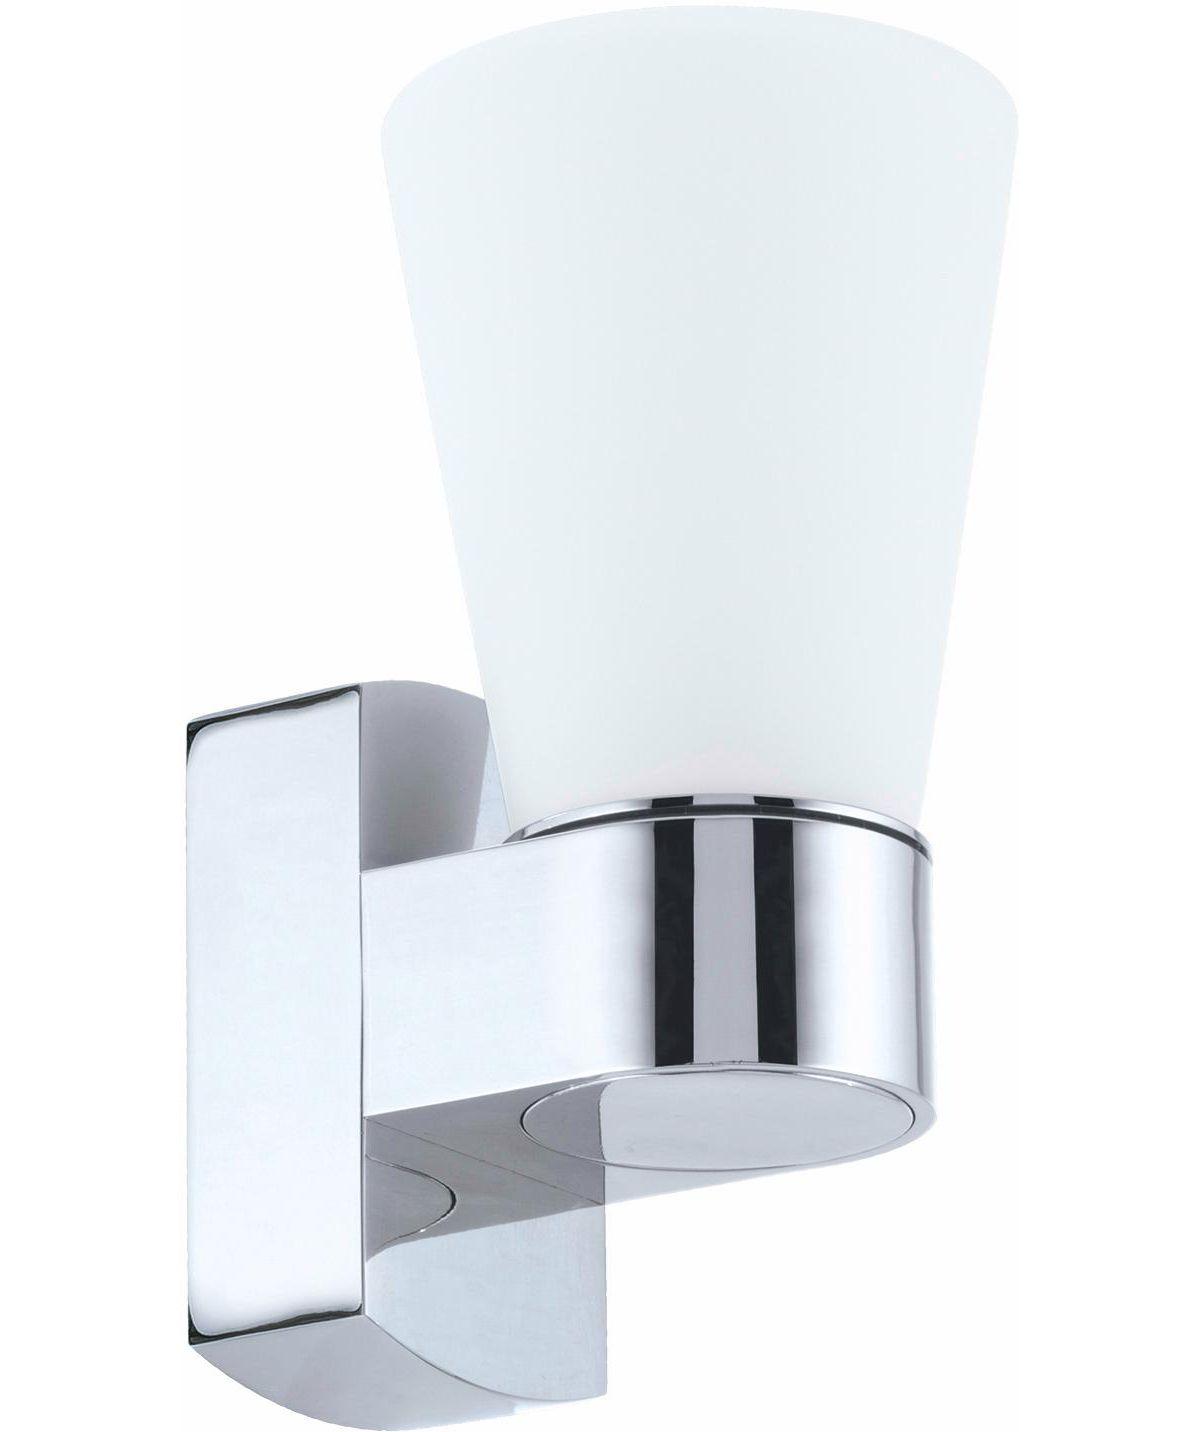 Eglo LED Wandleuchte, Badleuchte, 1flg., »CAILIN«